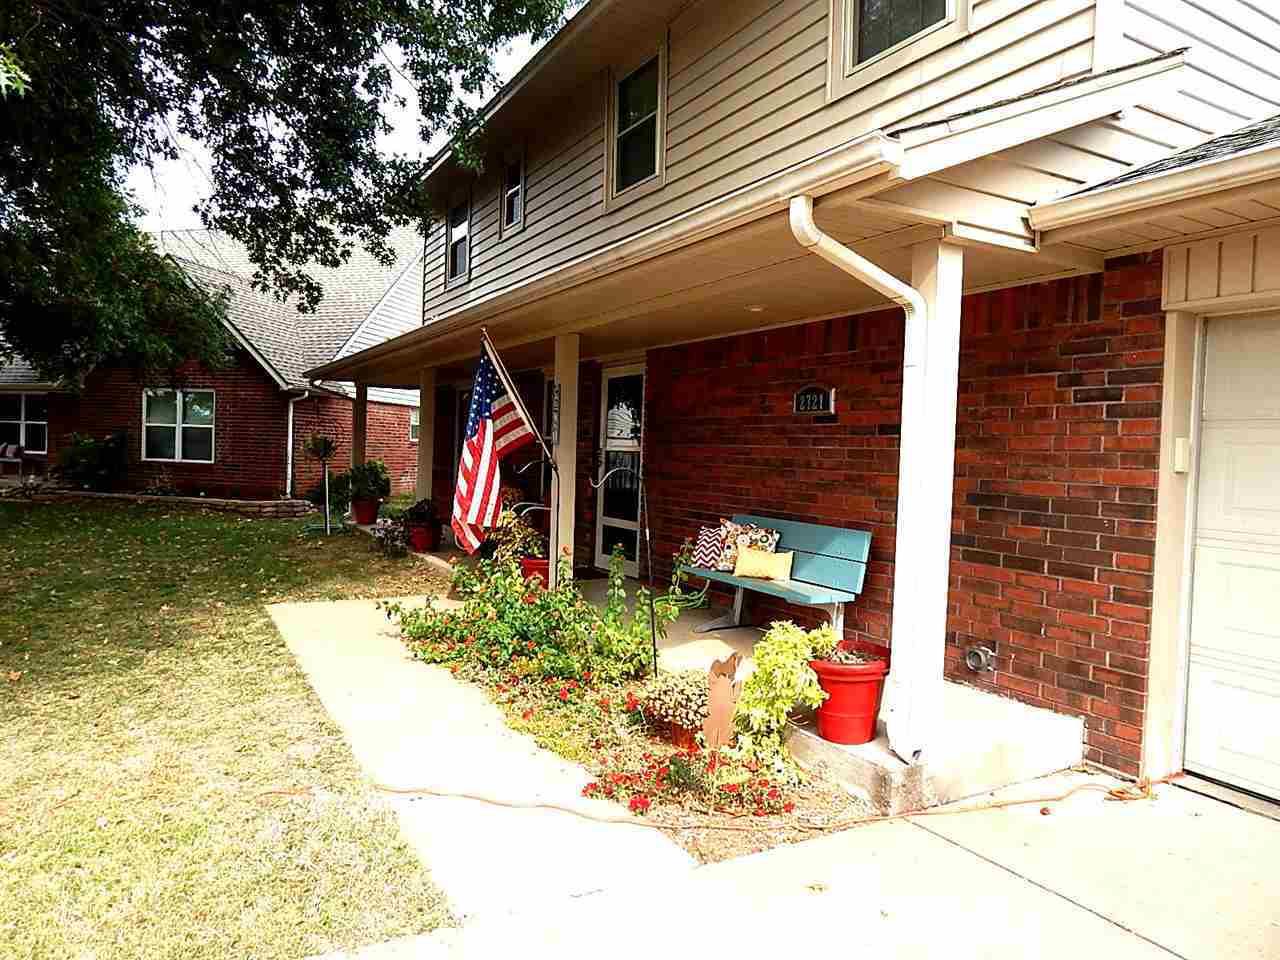 Sold Cross Sale W/ MLS | 2721 Wintergreen Ponca City, OK 74604 1